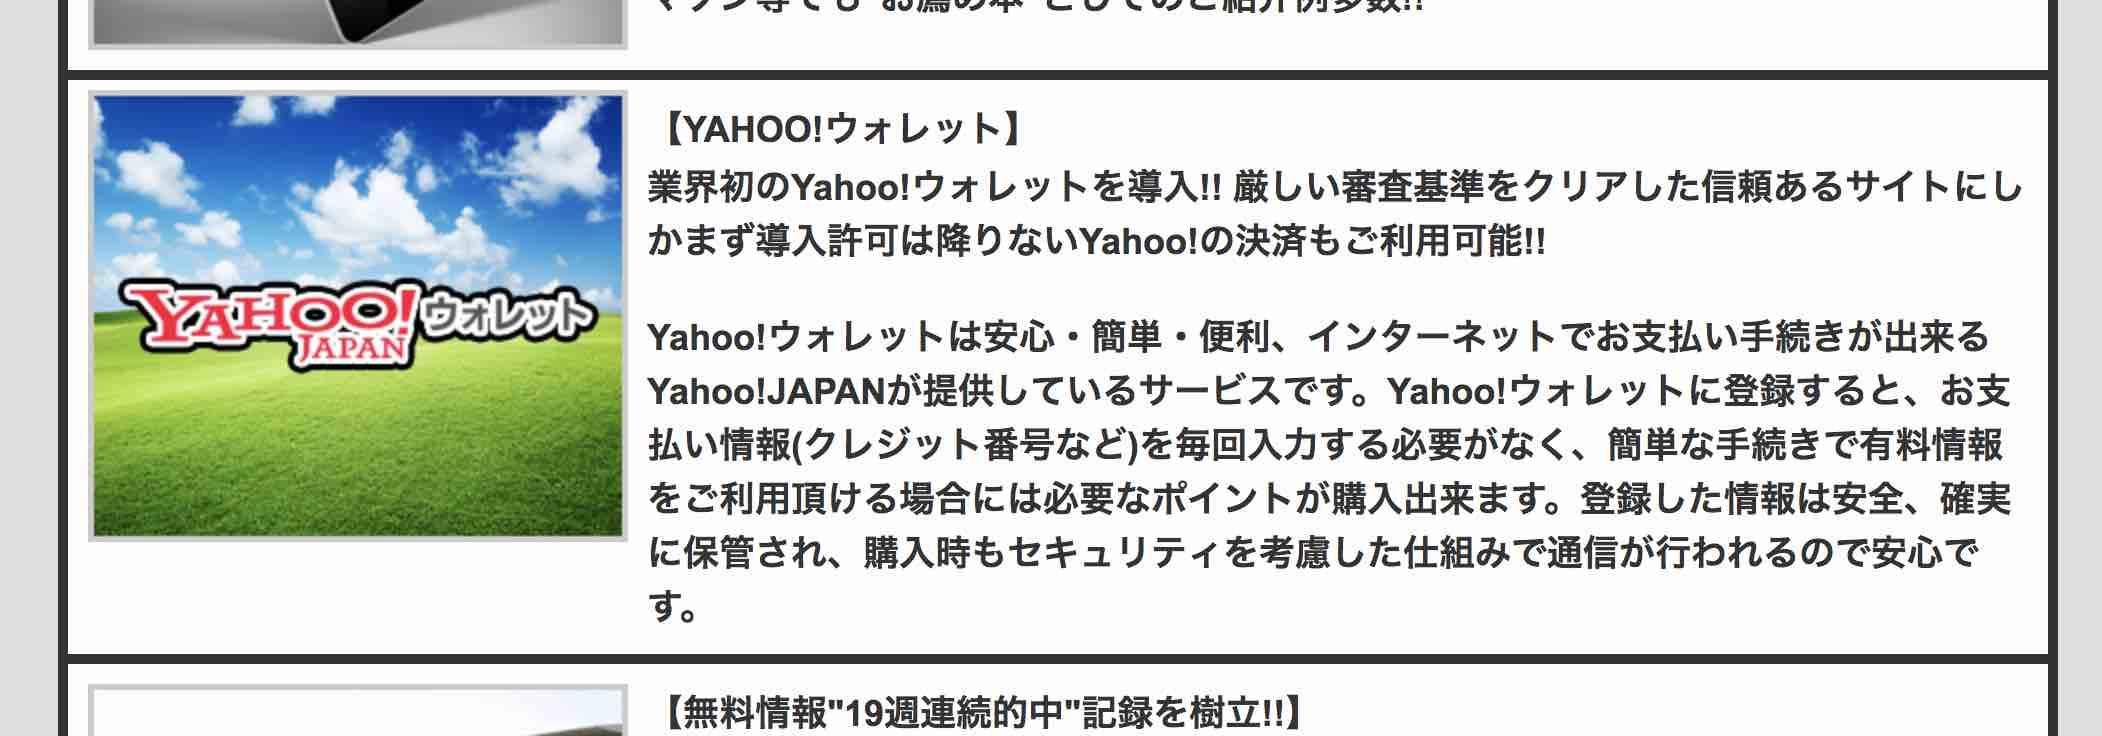 Yahoo!に認定されている競馬予想サイトはターフビジョンだけ